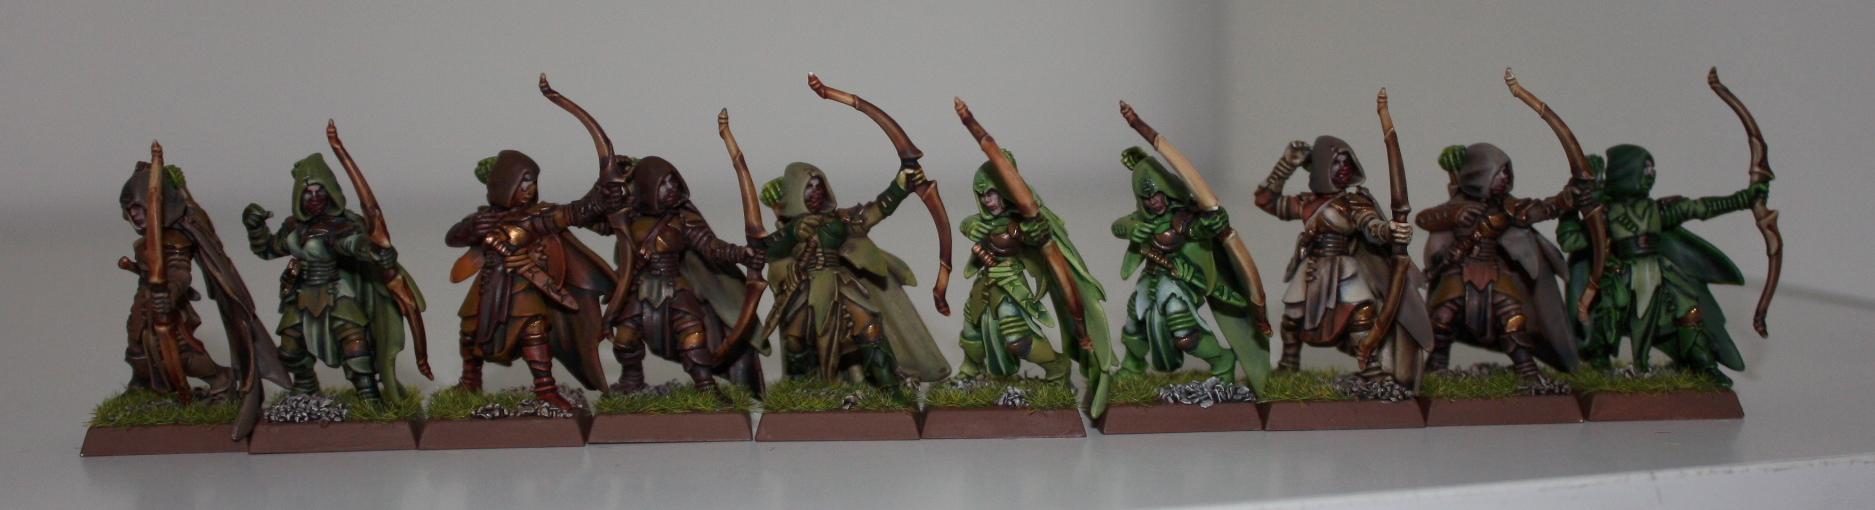 Archers, Bowmen, Cloaks, Infantry